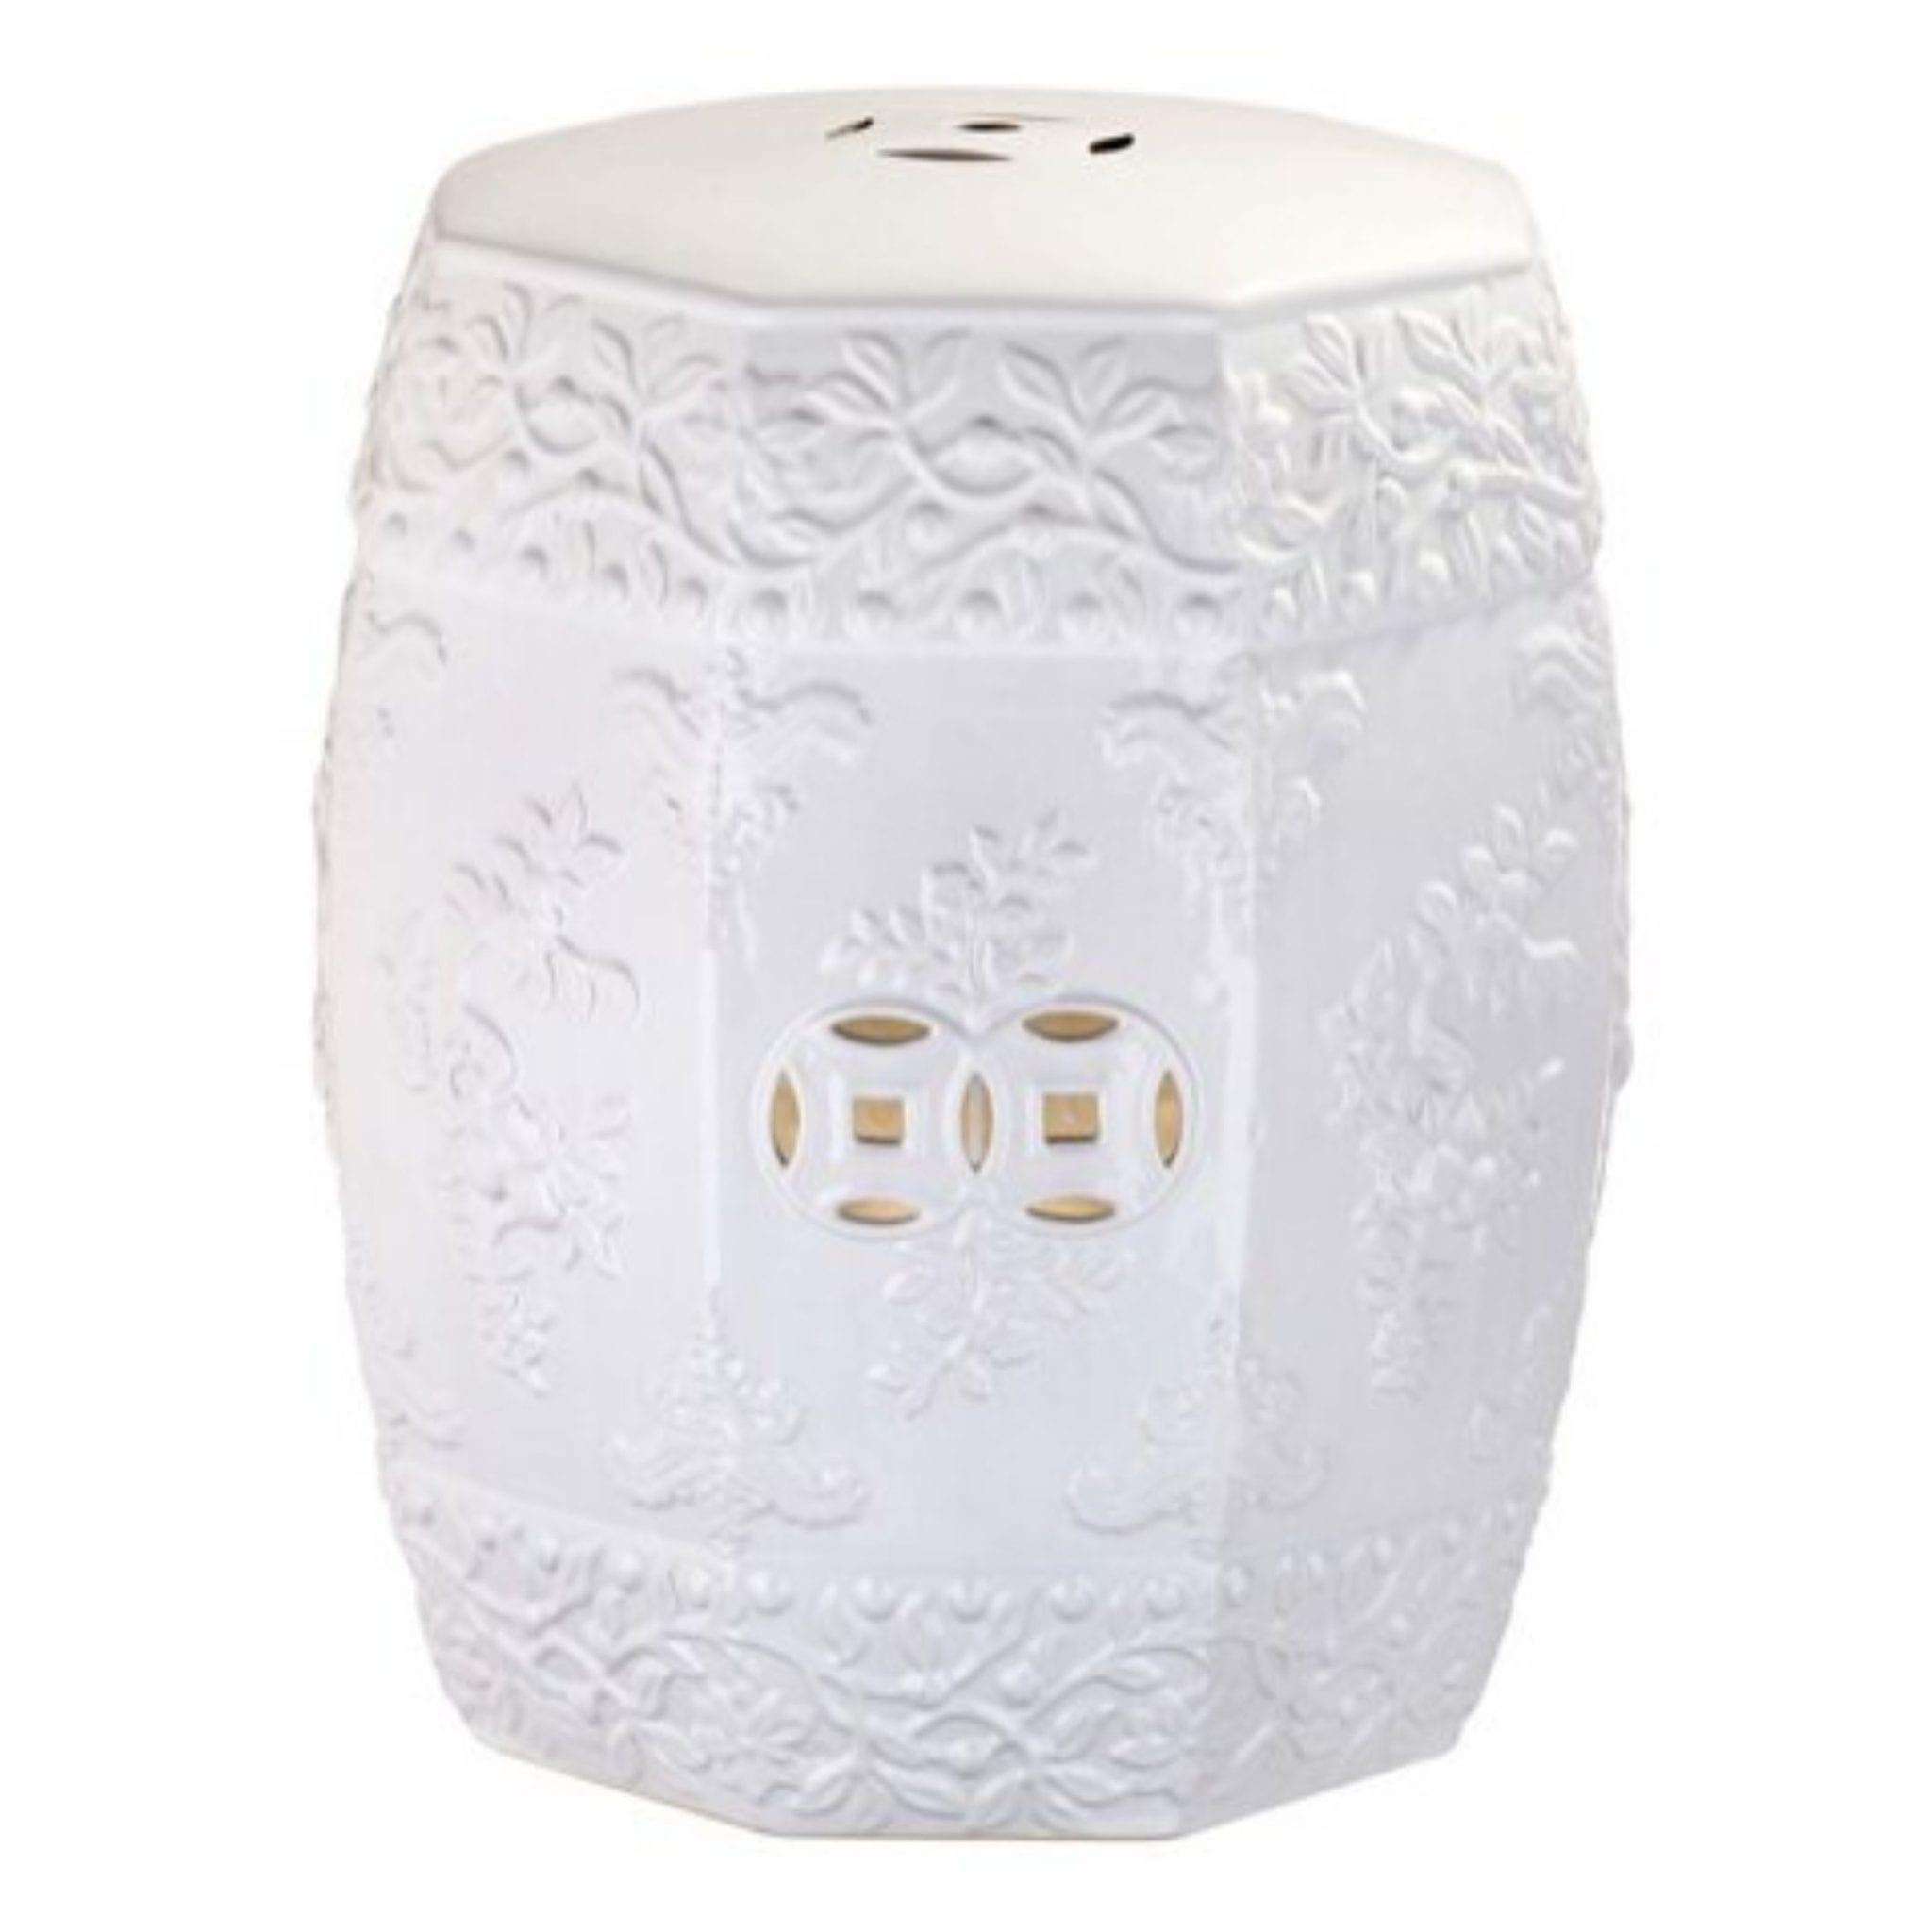 Zen Ren White Ceramic Garden Stool